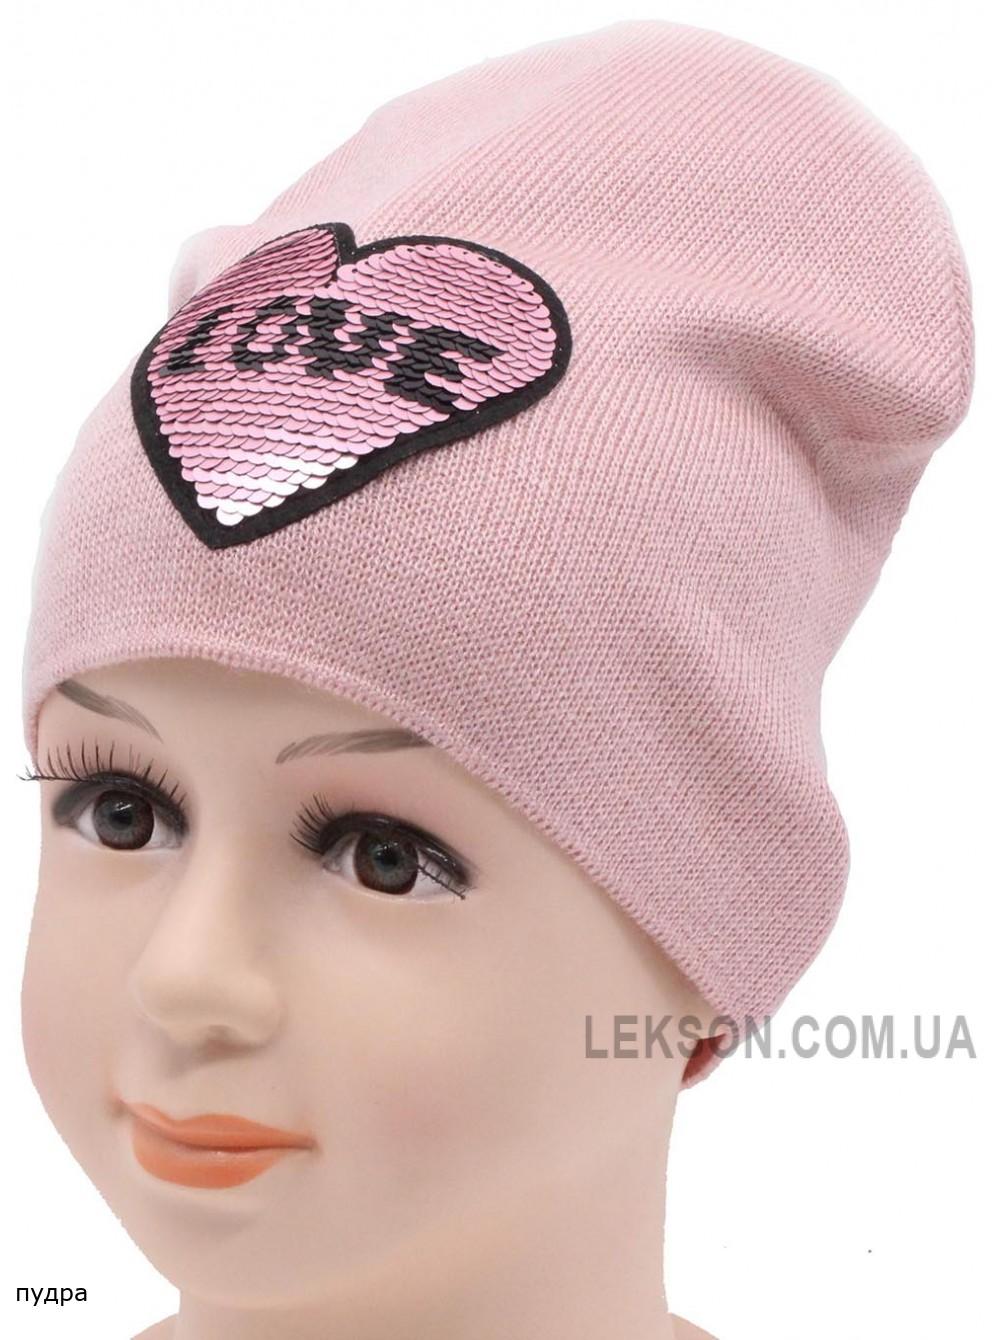 Детская вязаная шапка Лав DV10622-46-50